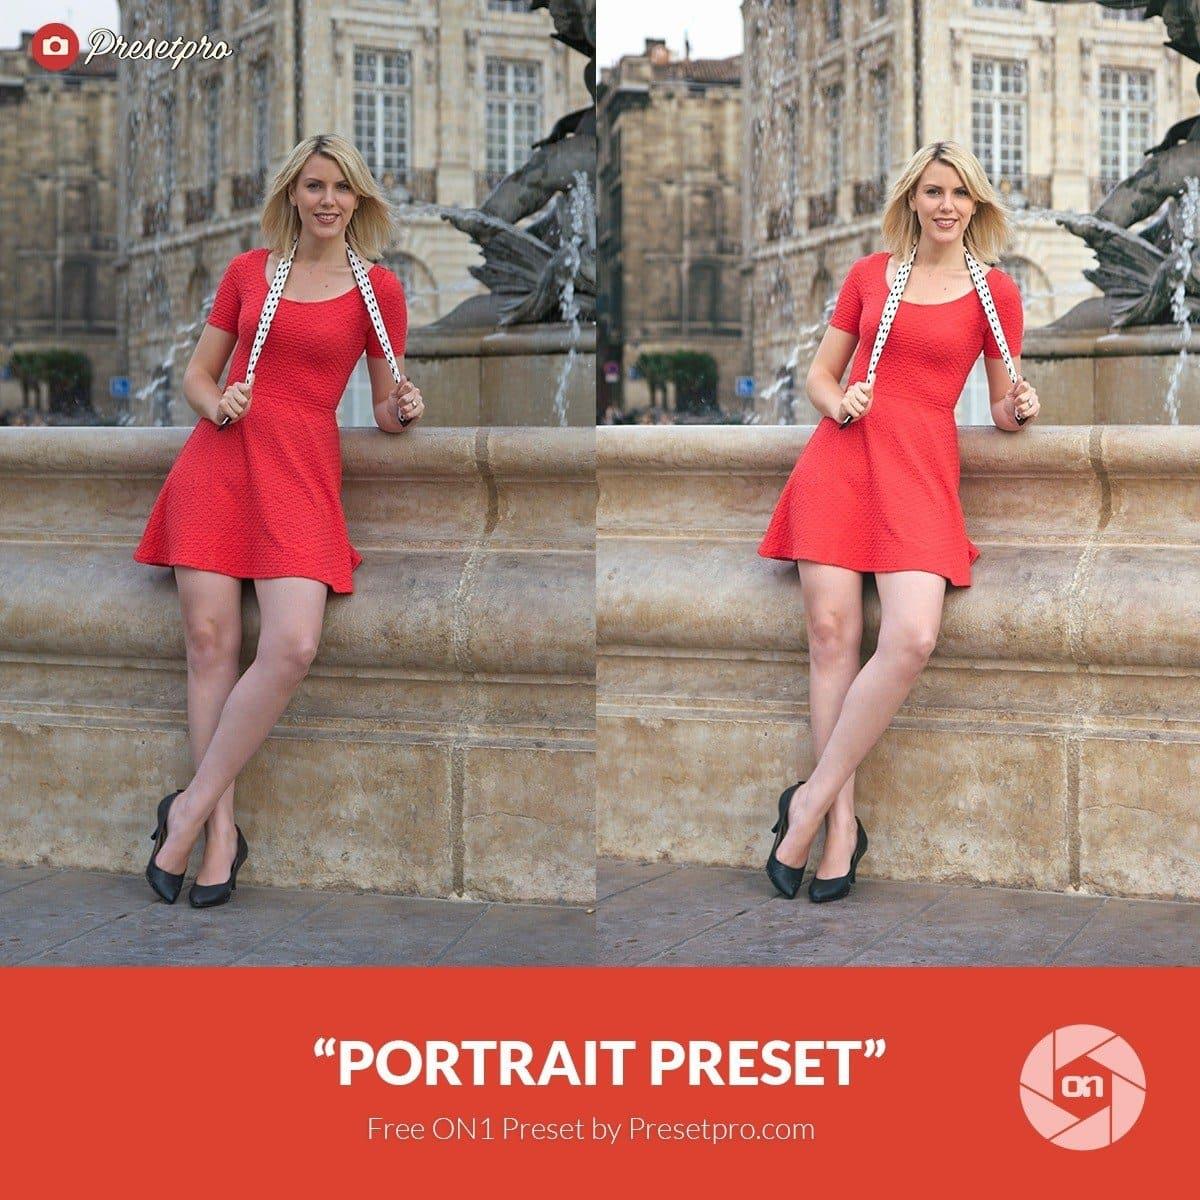 Free-On1-Preset-Portrait-Presetpro.com